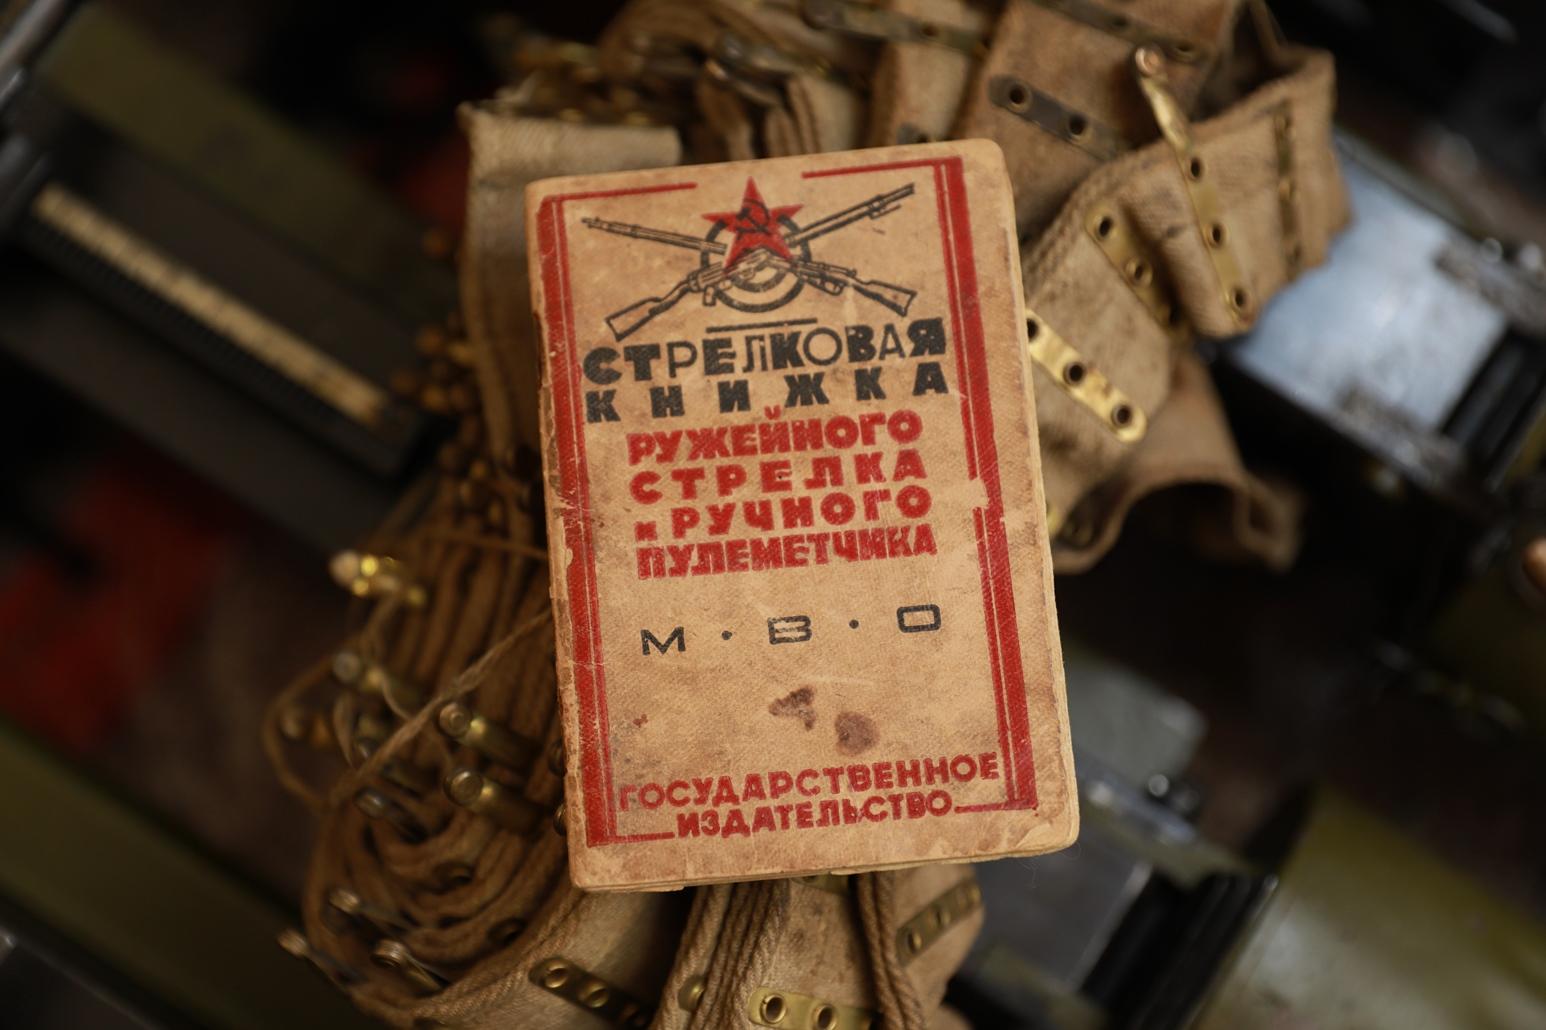 Стрелковая книжка ружейного стрелка и ручного пулеметчика, 1927 год